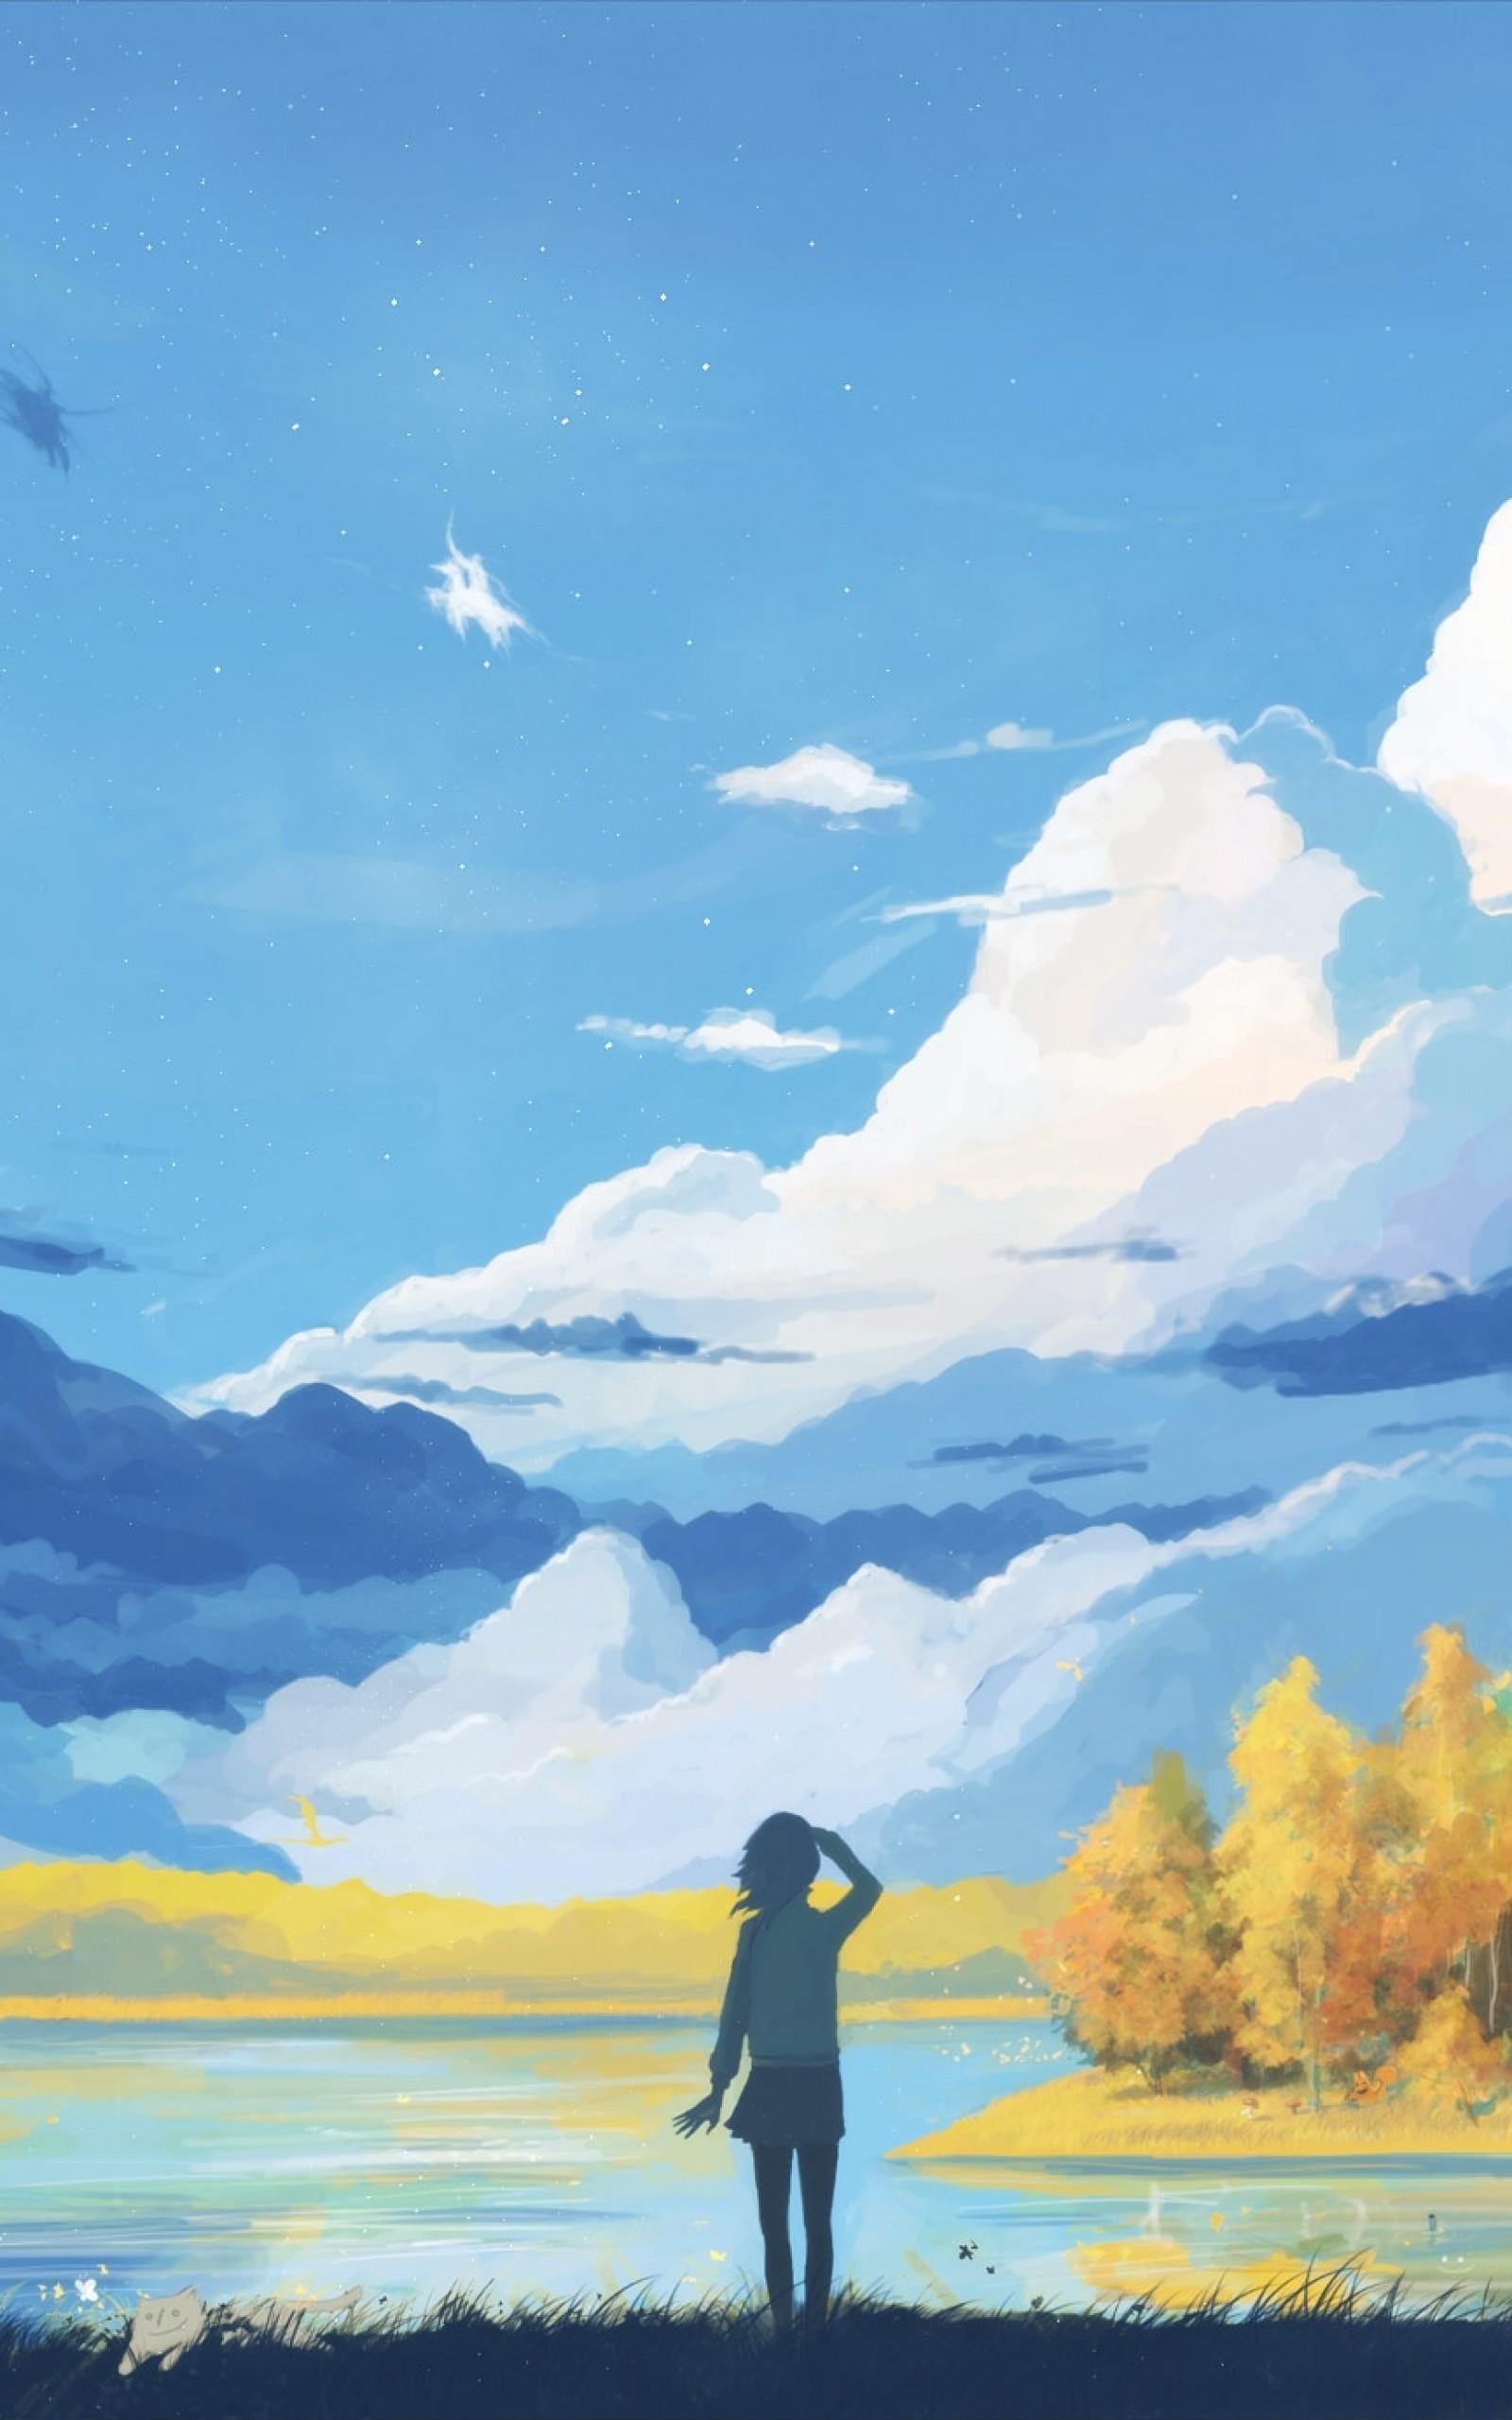 Peaceful Anime Background : peaceful, anime, background, Relaxing, Anime, Wallpapers, Wallpaper